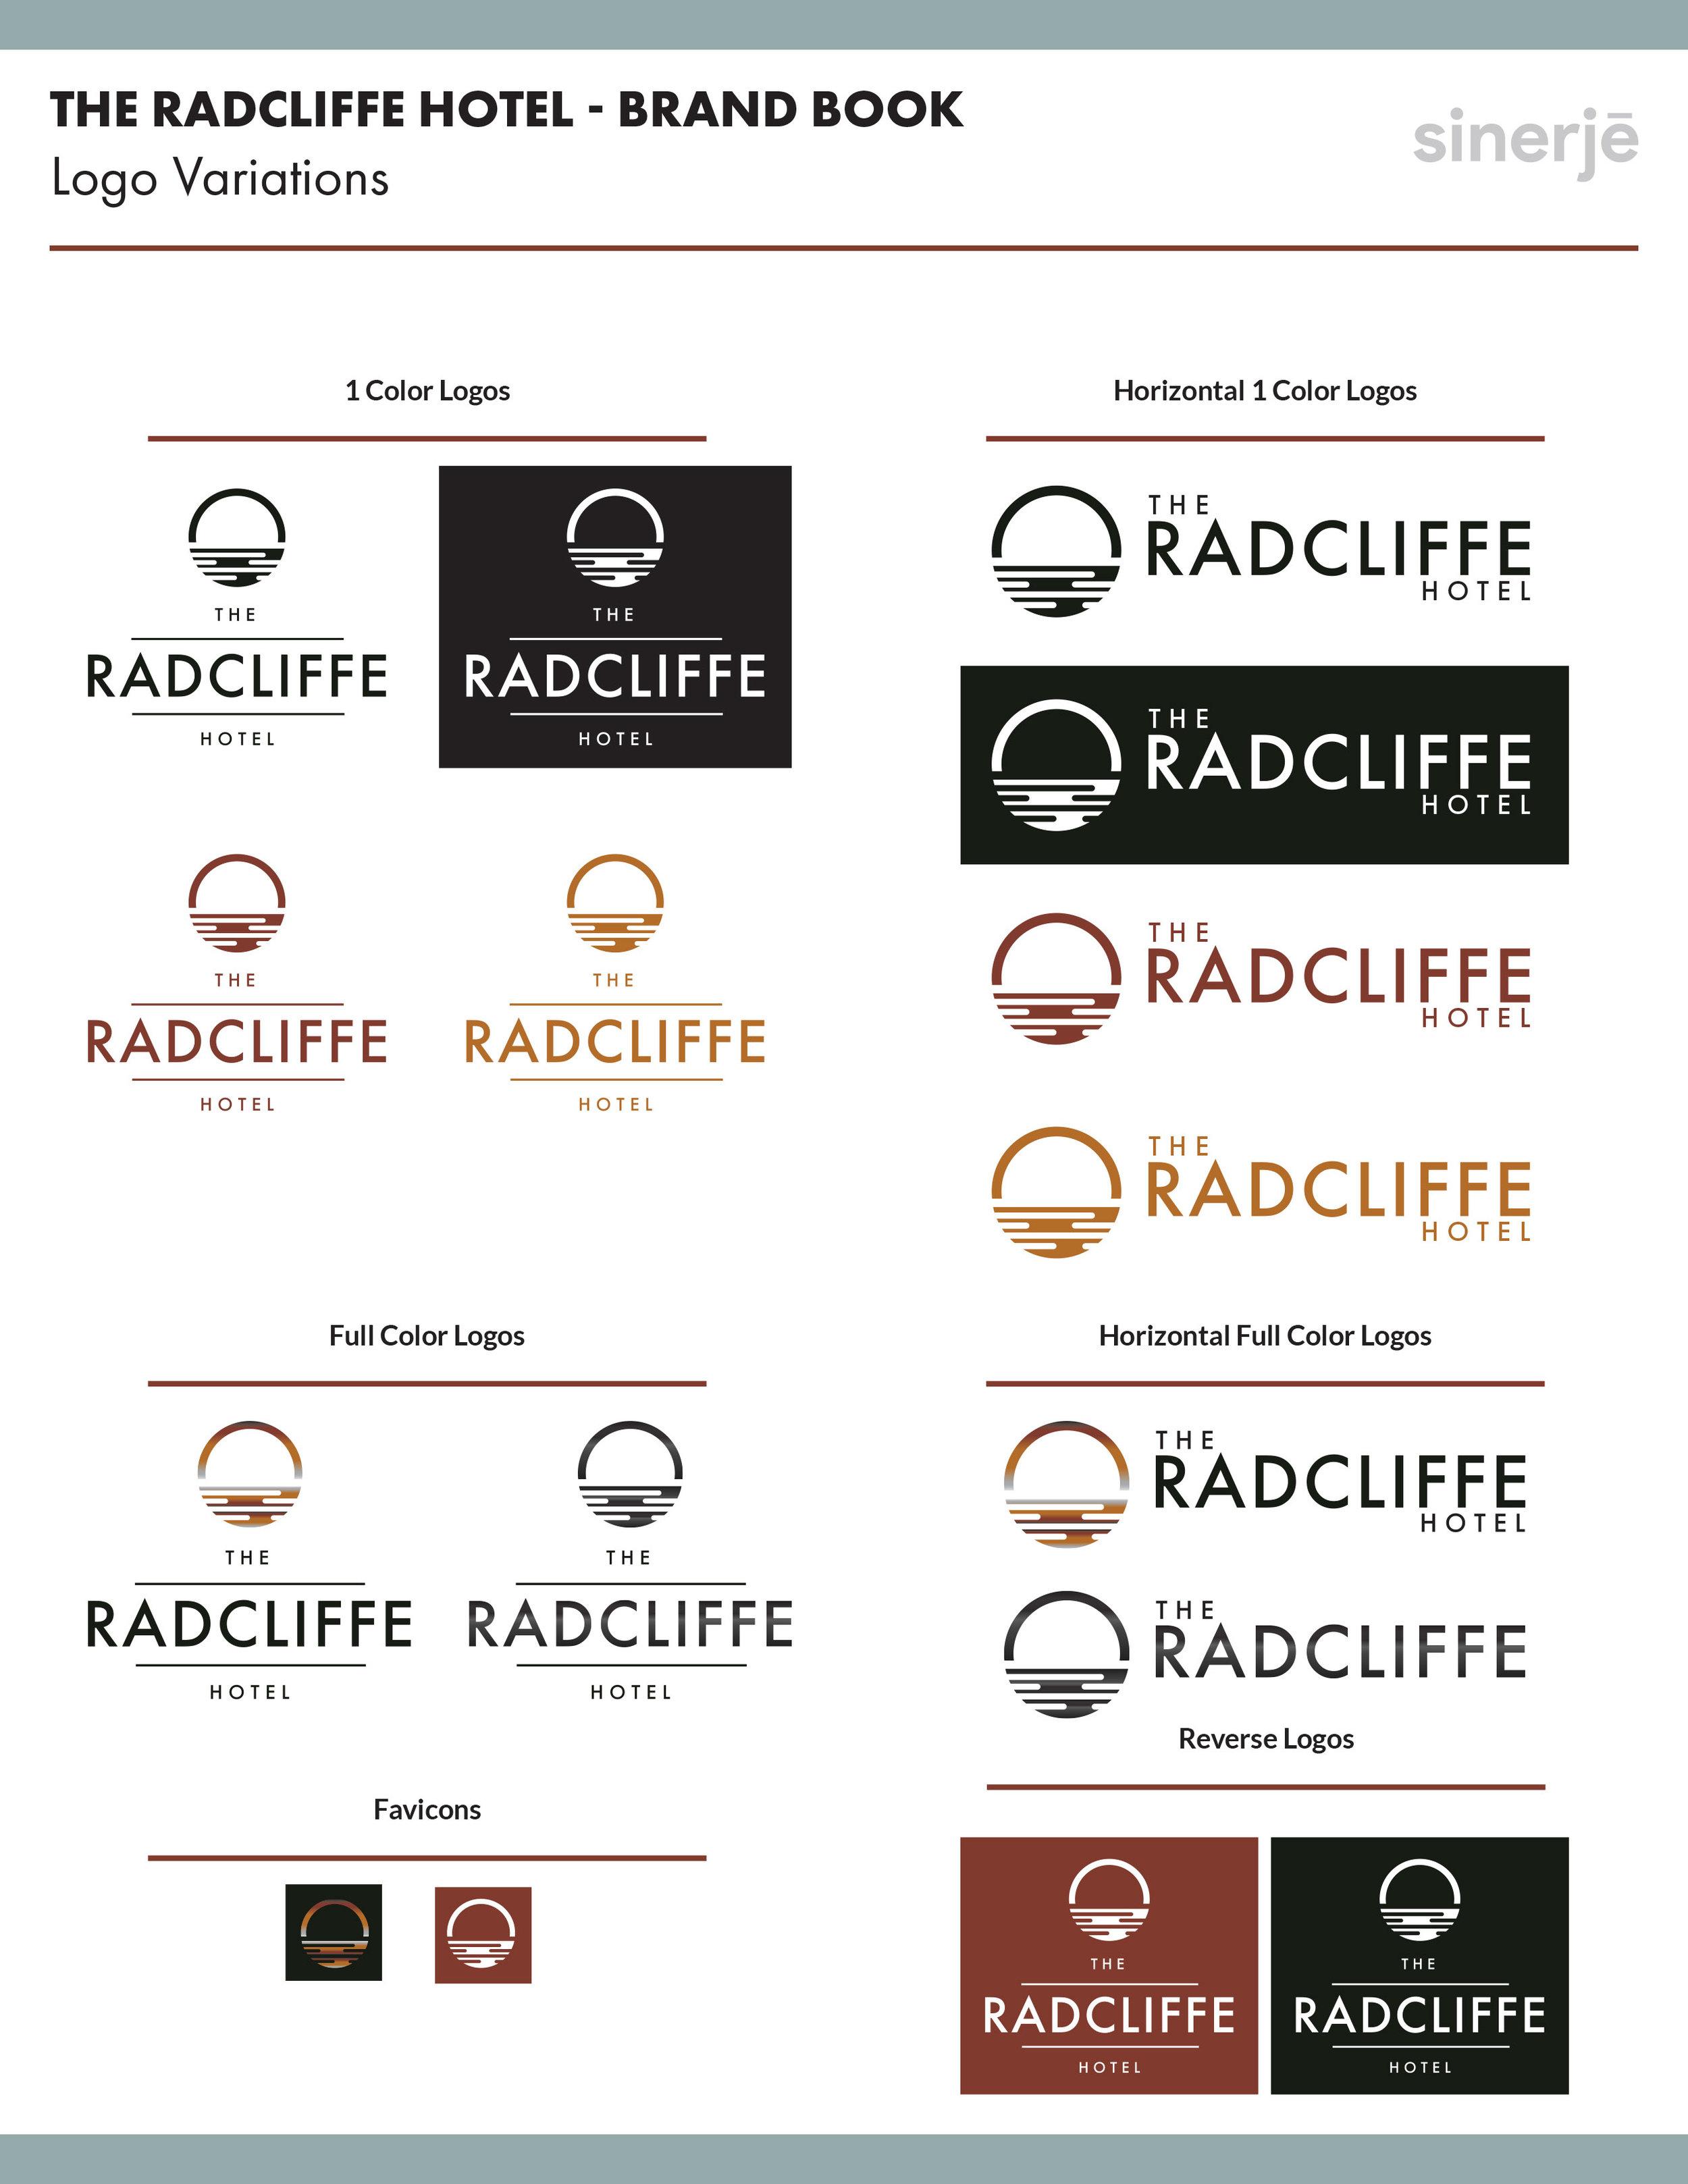 Brand Book Guideline 3.jpg